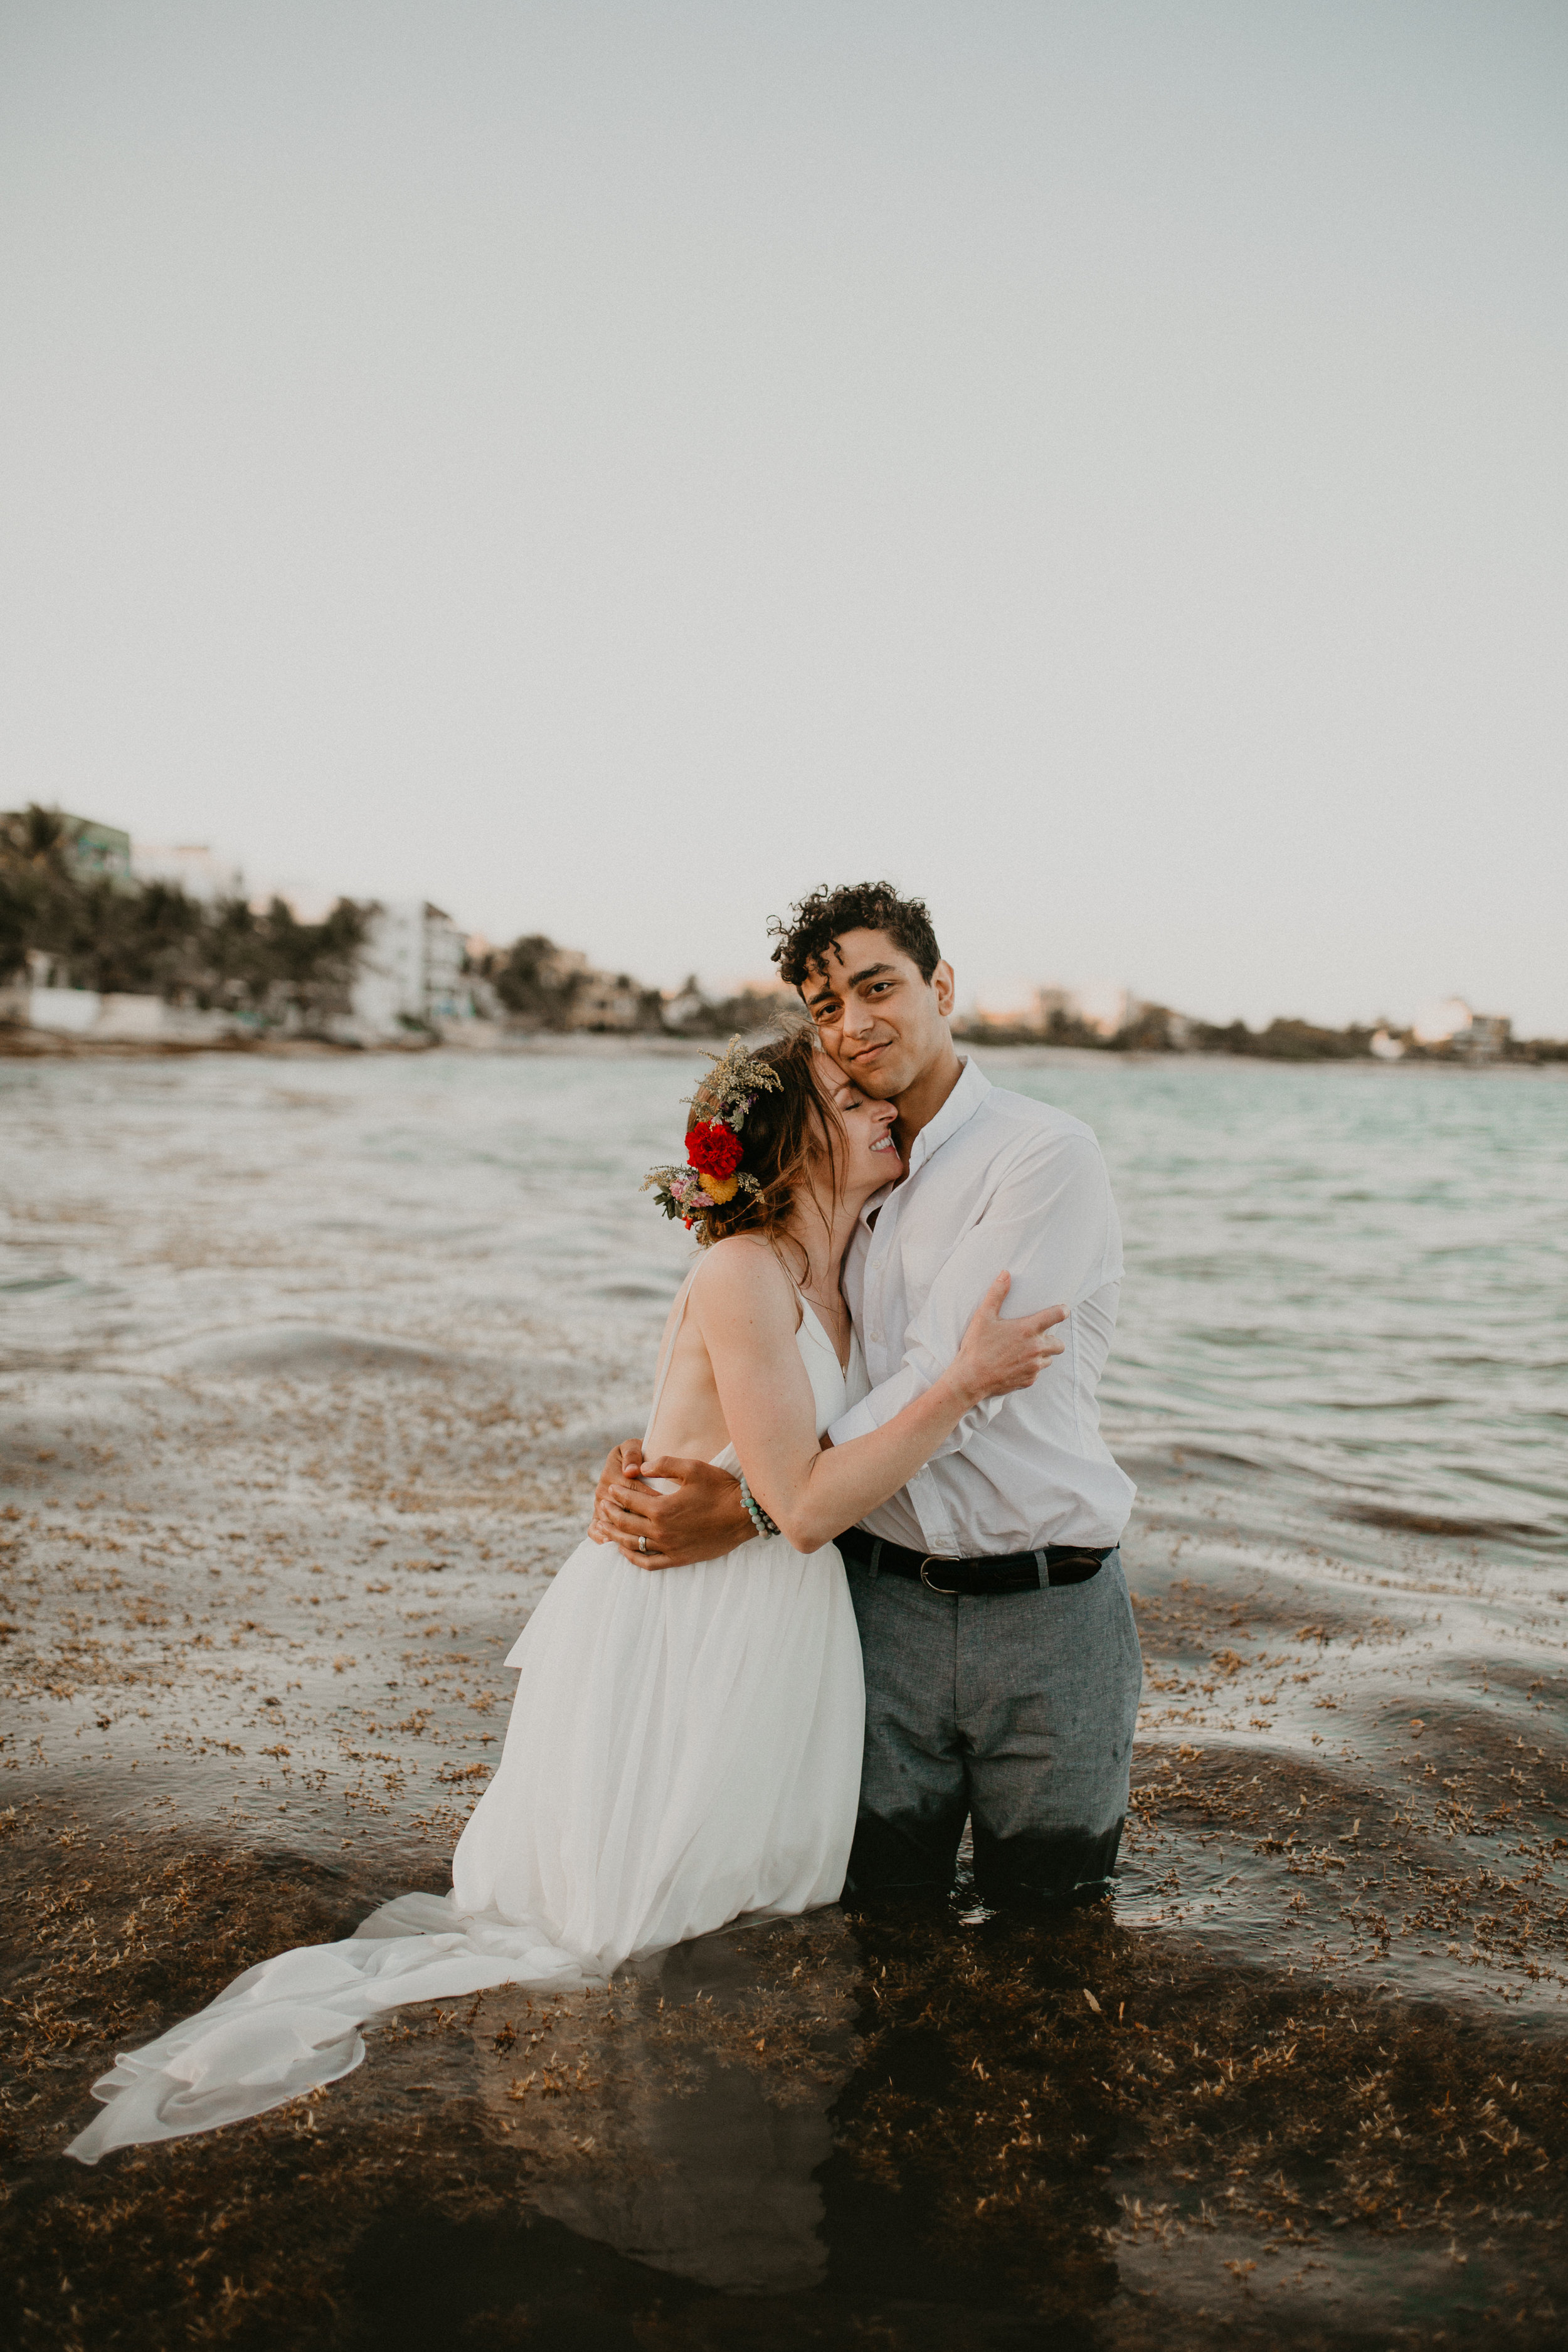 Nicole-Daacke-Photography-beachfront-akumal-destionation-wedding-tulum-mexico-elopement-photographer-destination-wedding-inspiration-sunset-champagne-pop-boho-bride-ocean-tropical-bohemian-tulum-wedding-photos-198.jpg